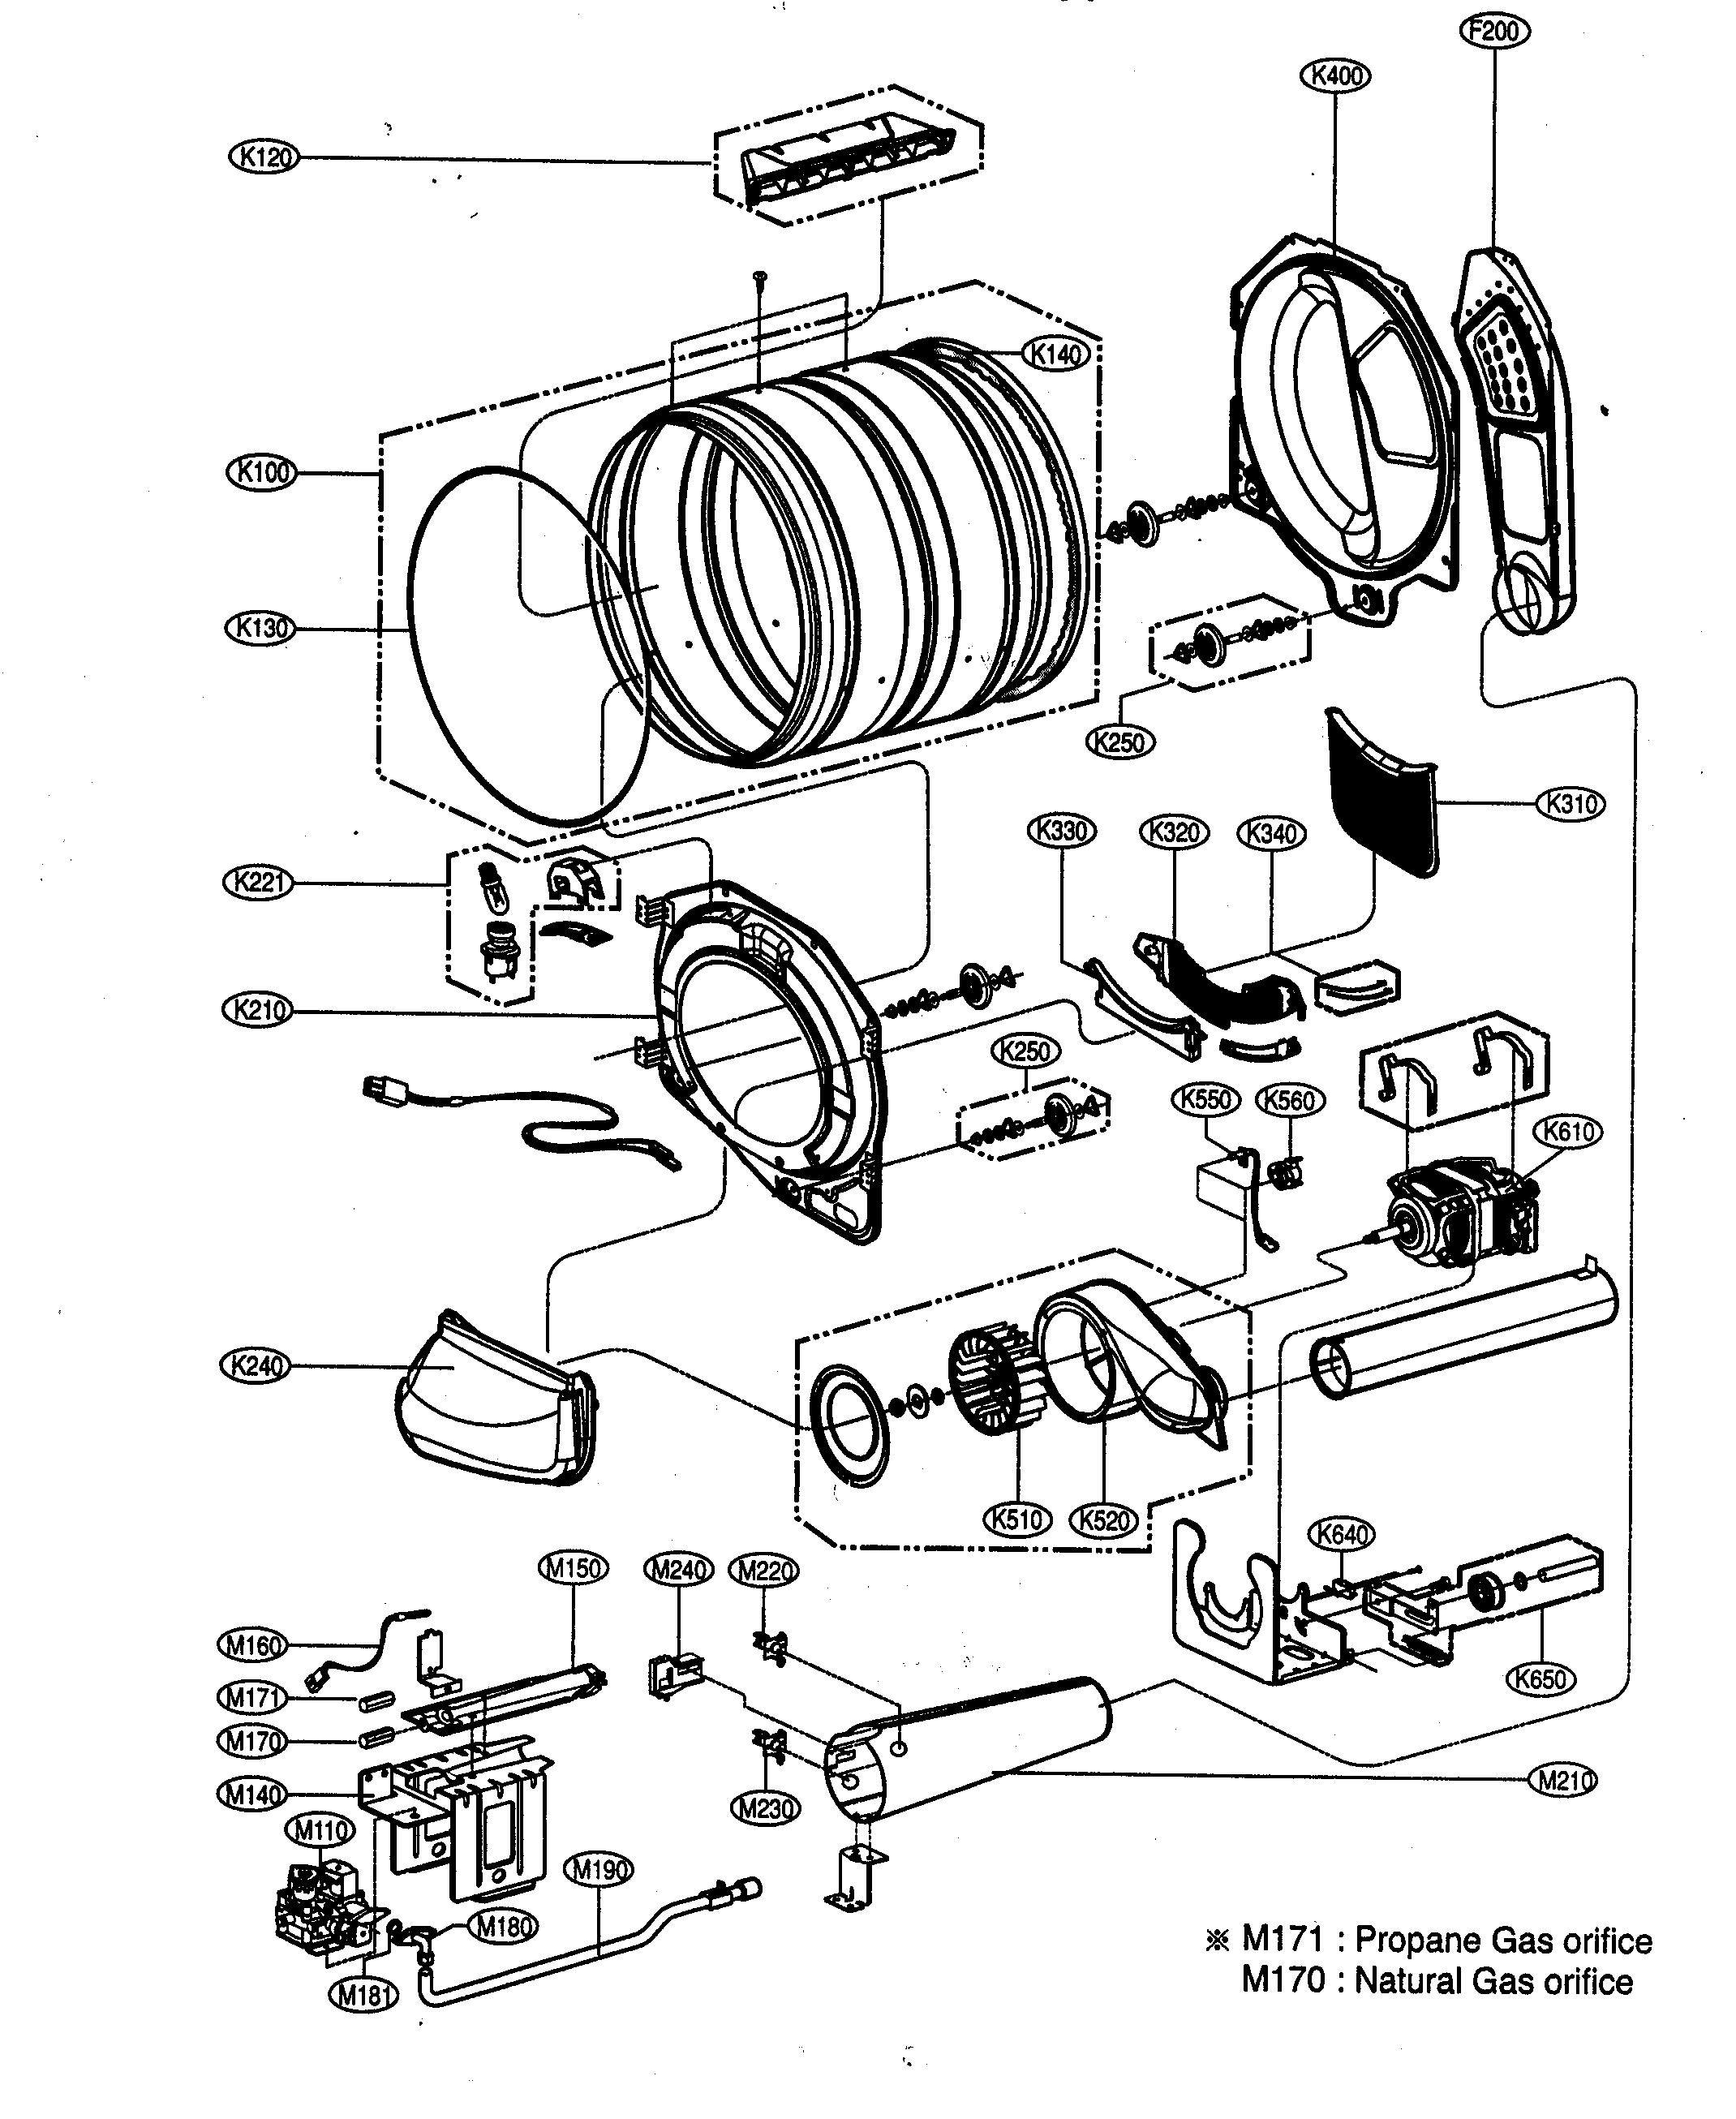 32 gas dryer diagram